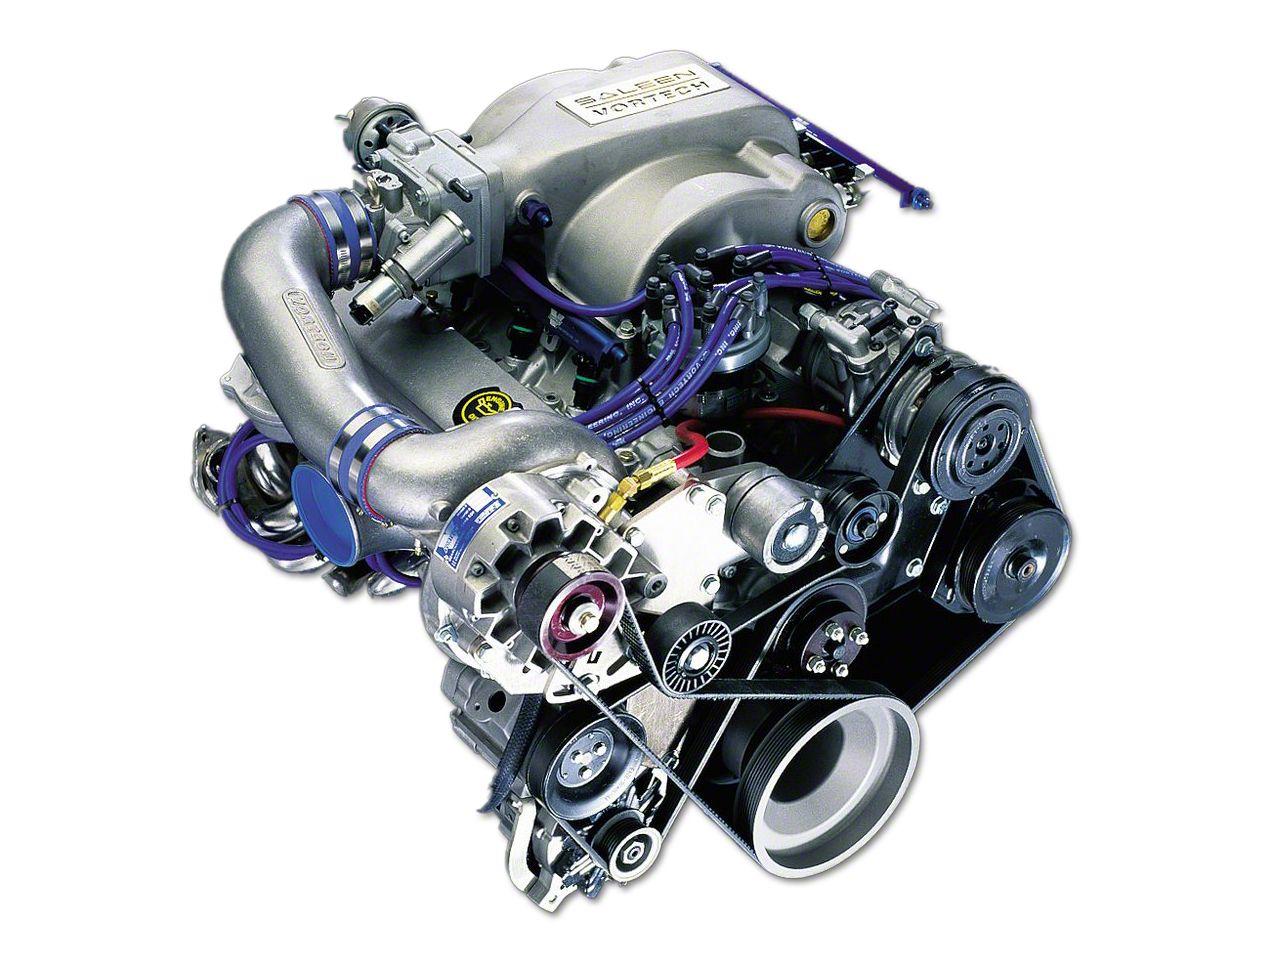 Vortech V-7 YSI S.H.O. Supercharger Kit Passager Side - Satin (86-93 5.0L)